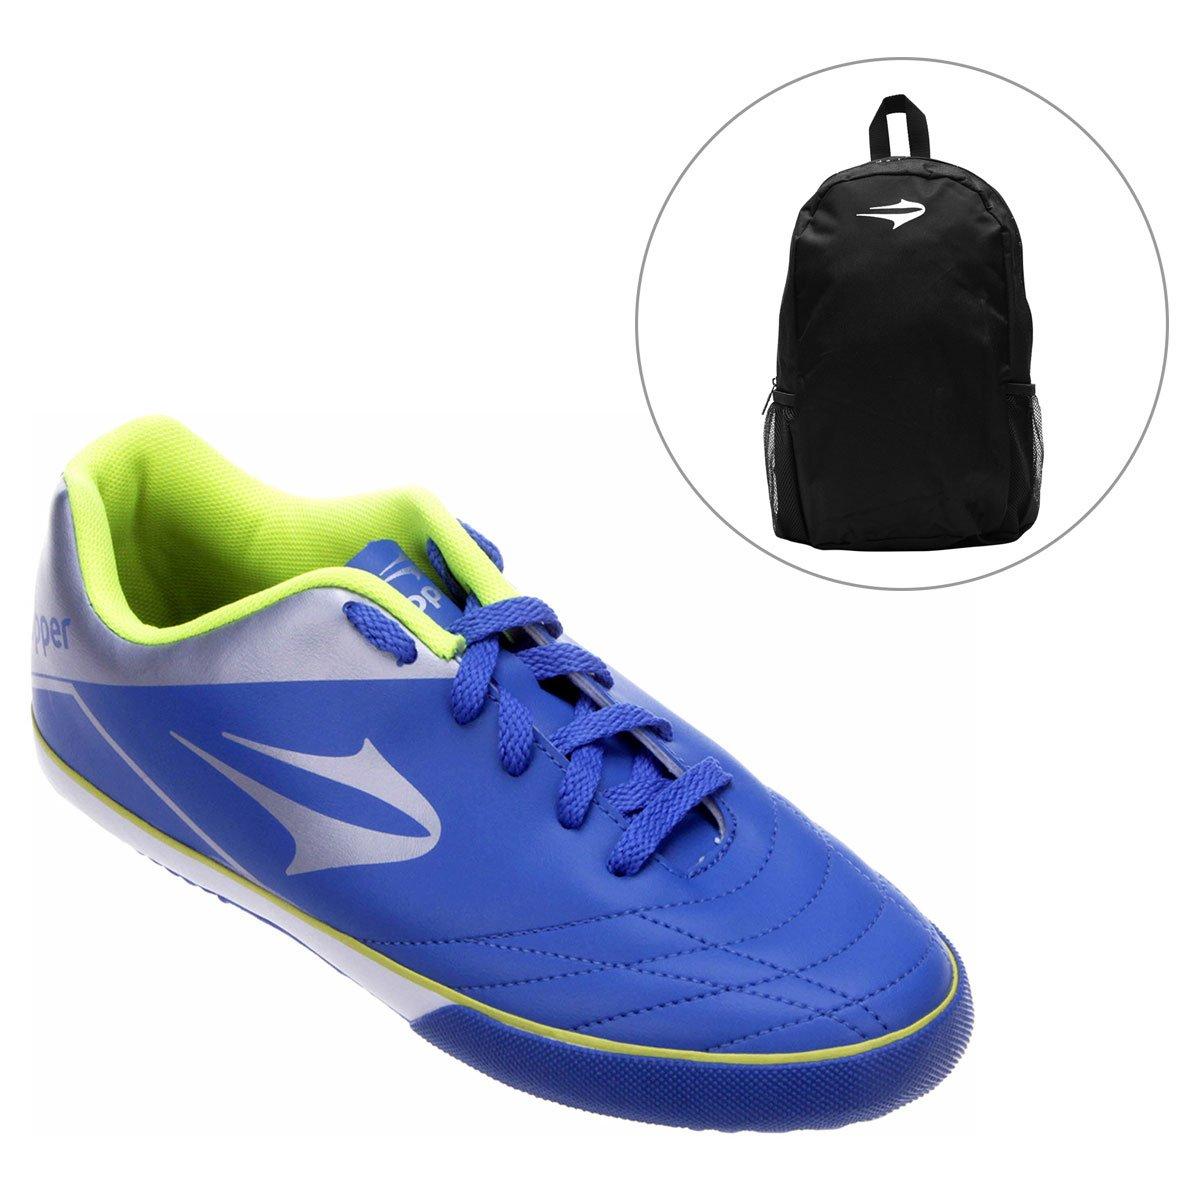 Chuteira Topper Frontier 7 Futsal + Mochila Topper Extreme - Compre Agora  40b6f32c42ee7